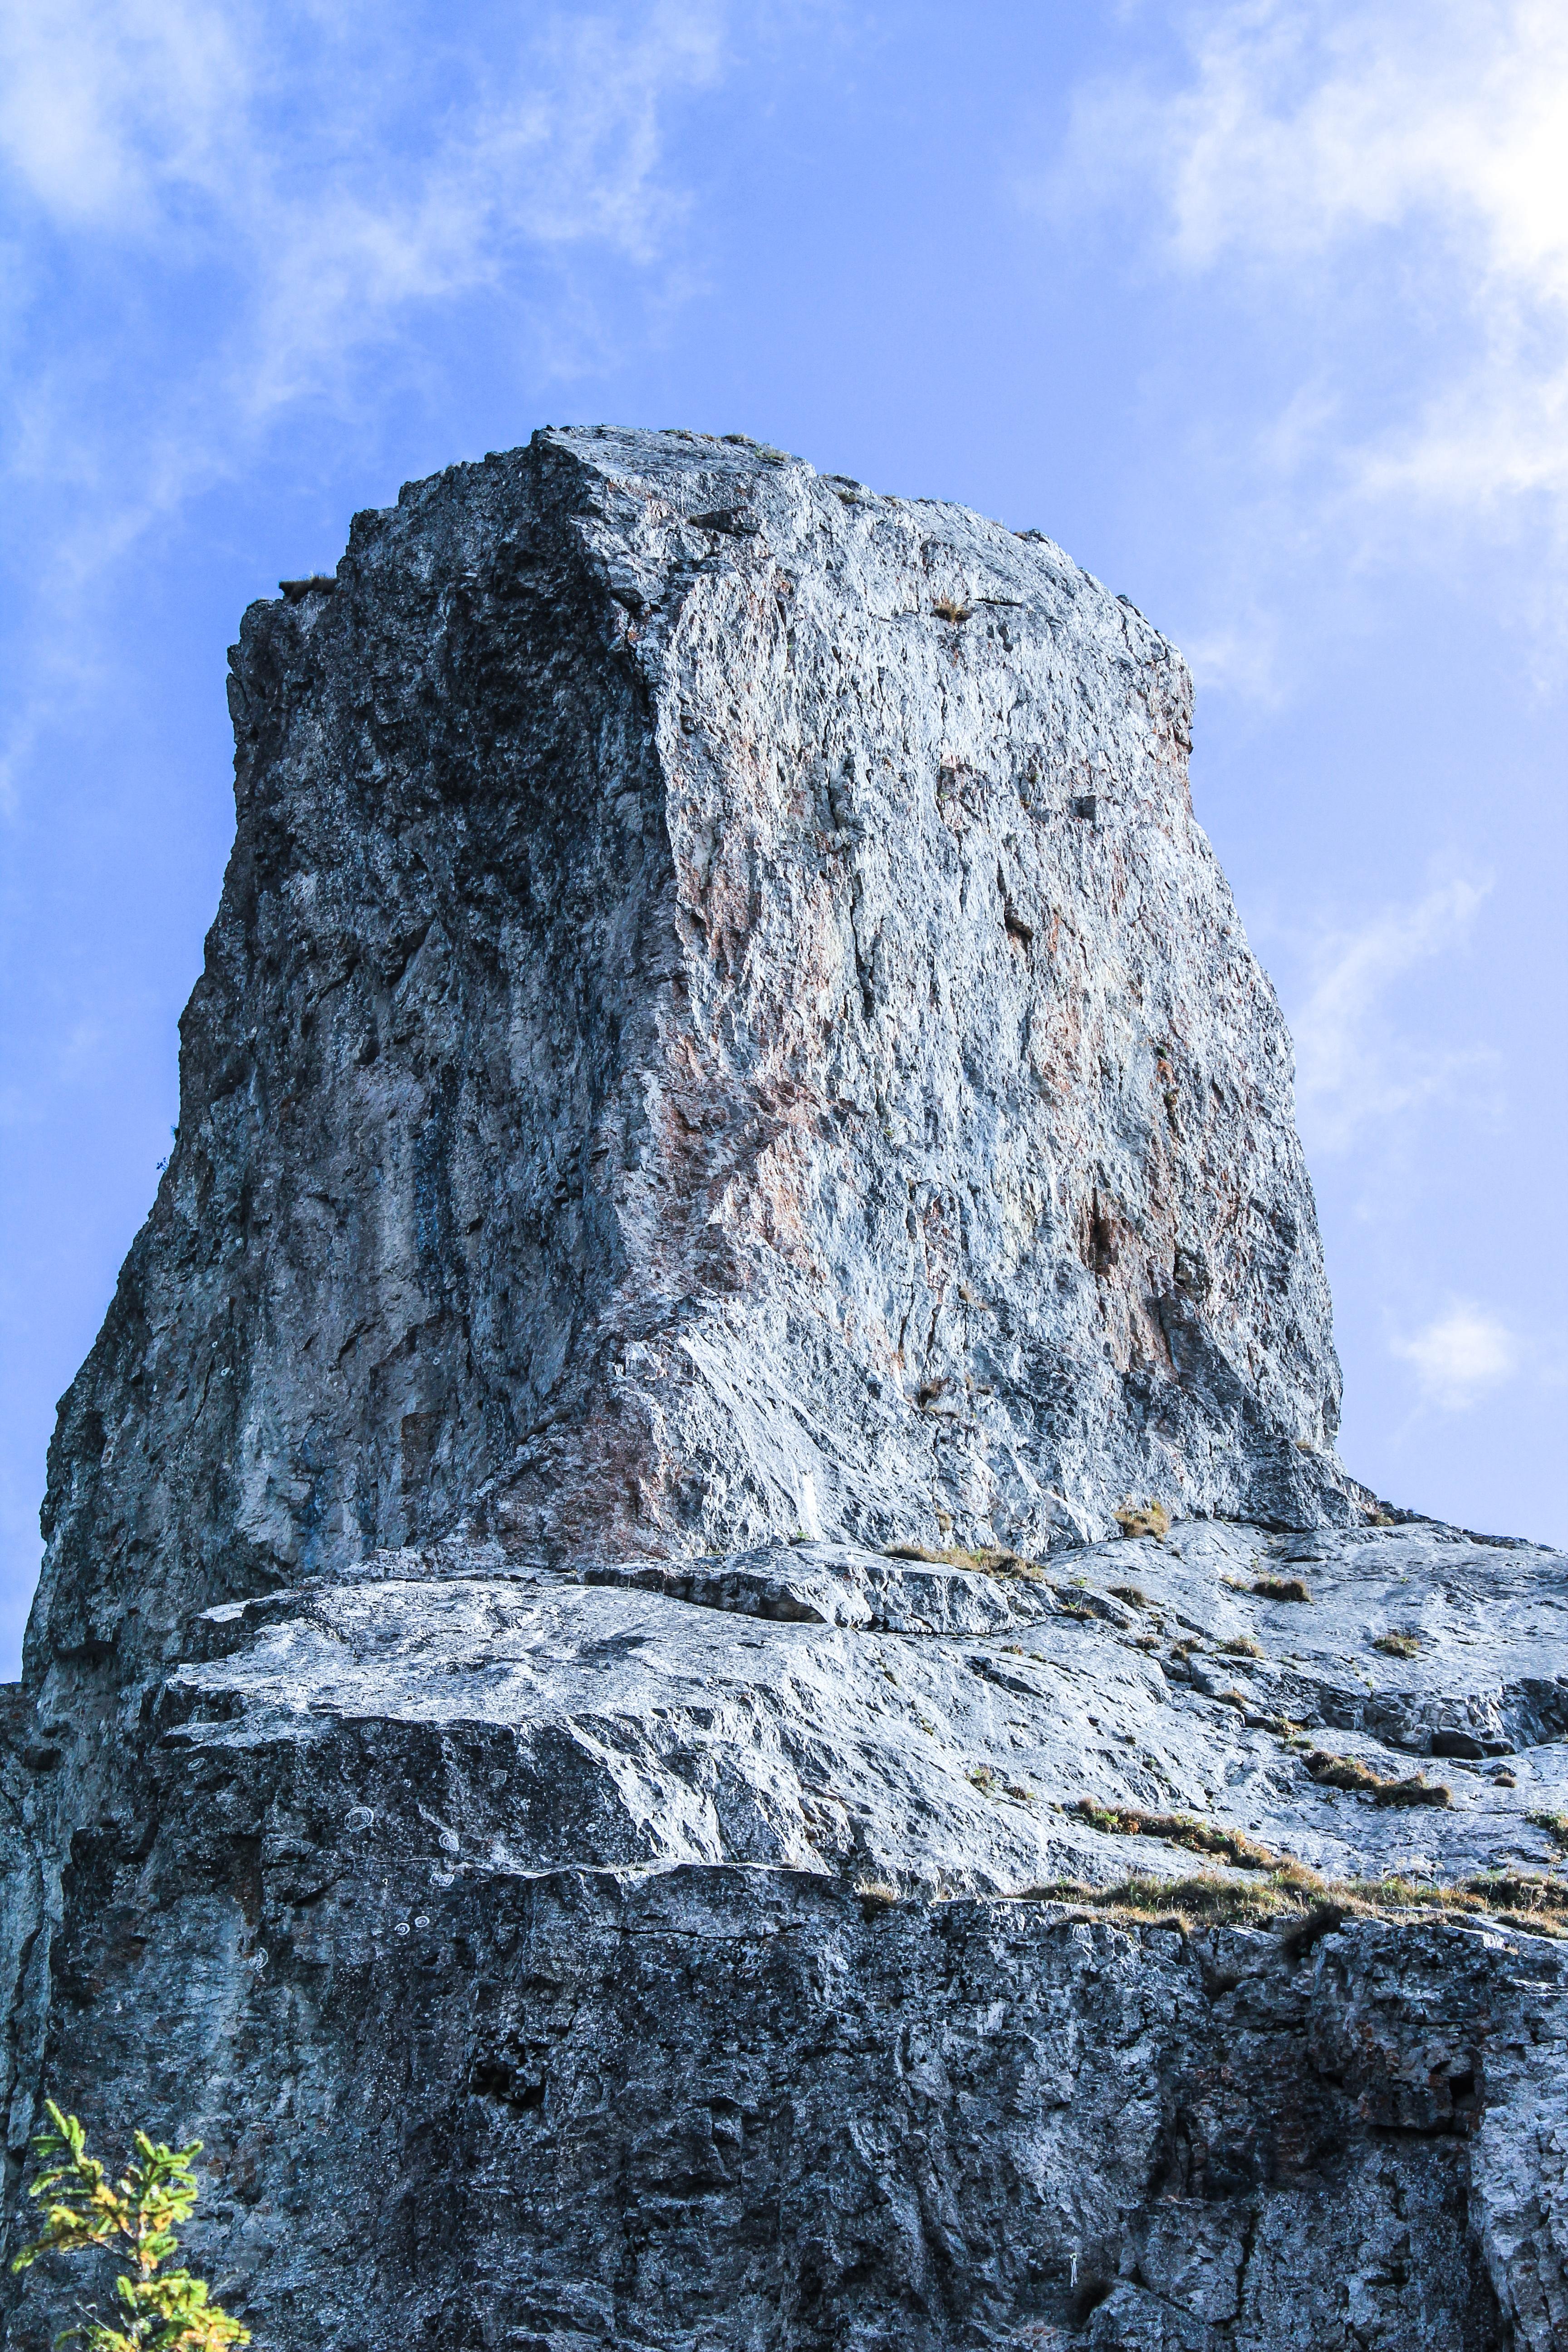 Kostenlose foto : Natur, Rock, Berg, Wandern, Abenteuer, Haupt ...